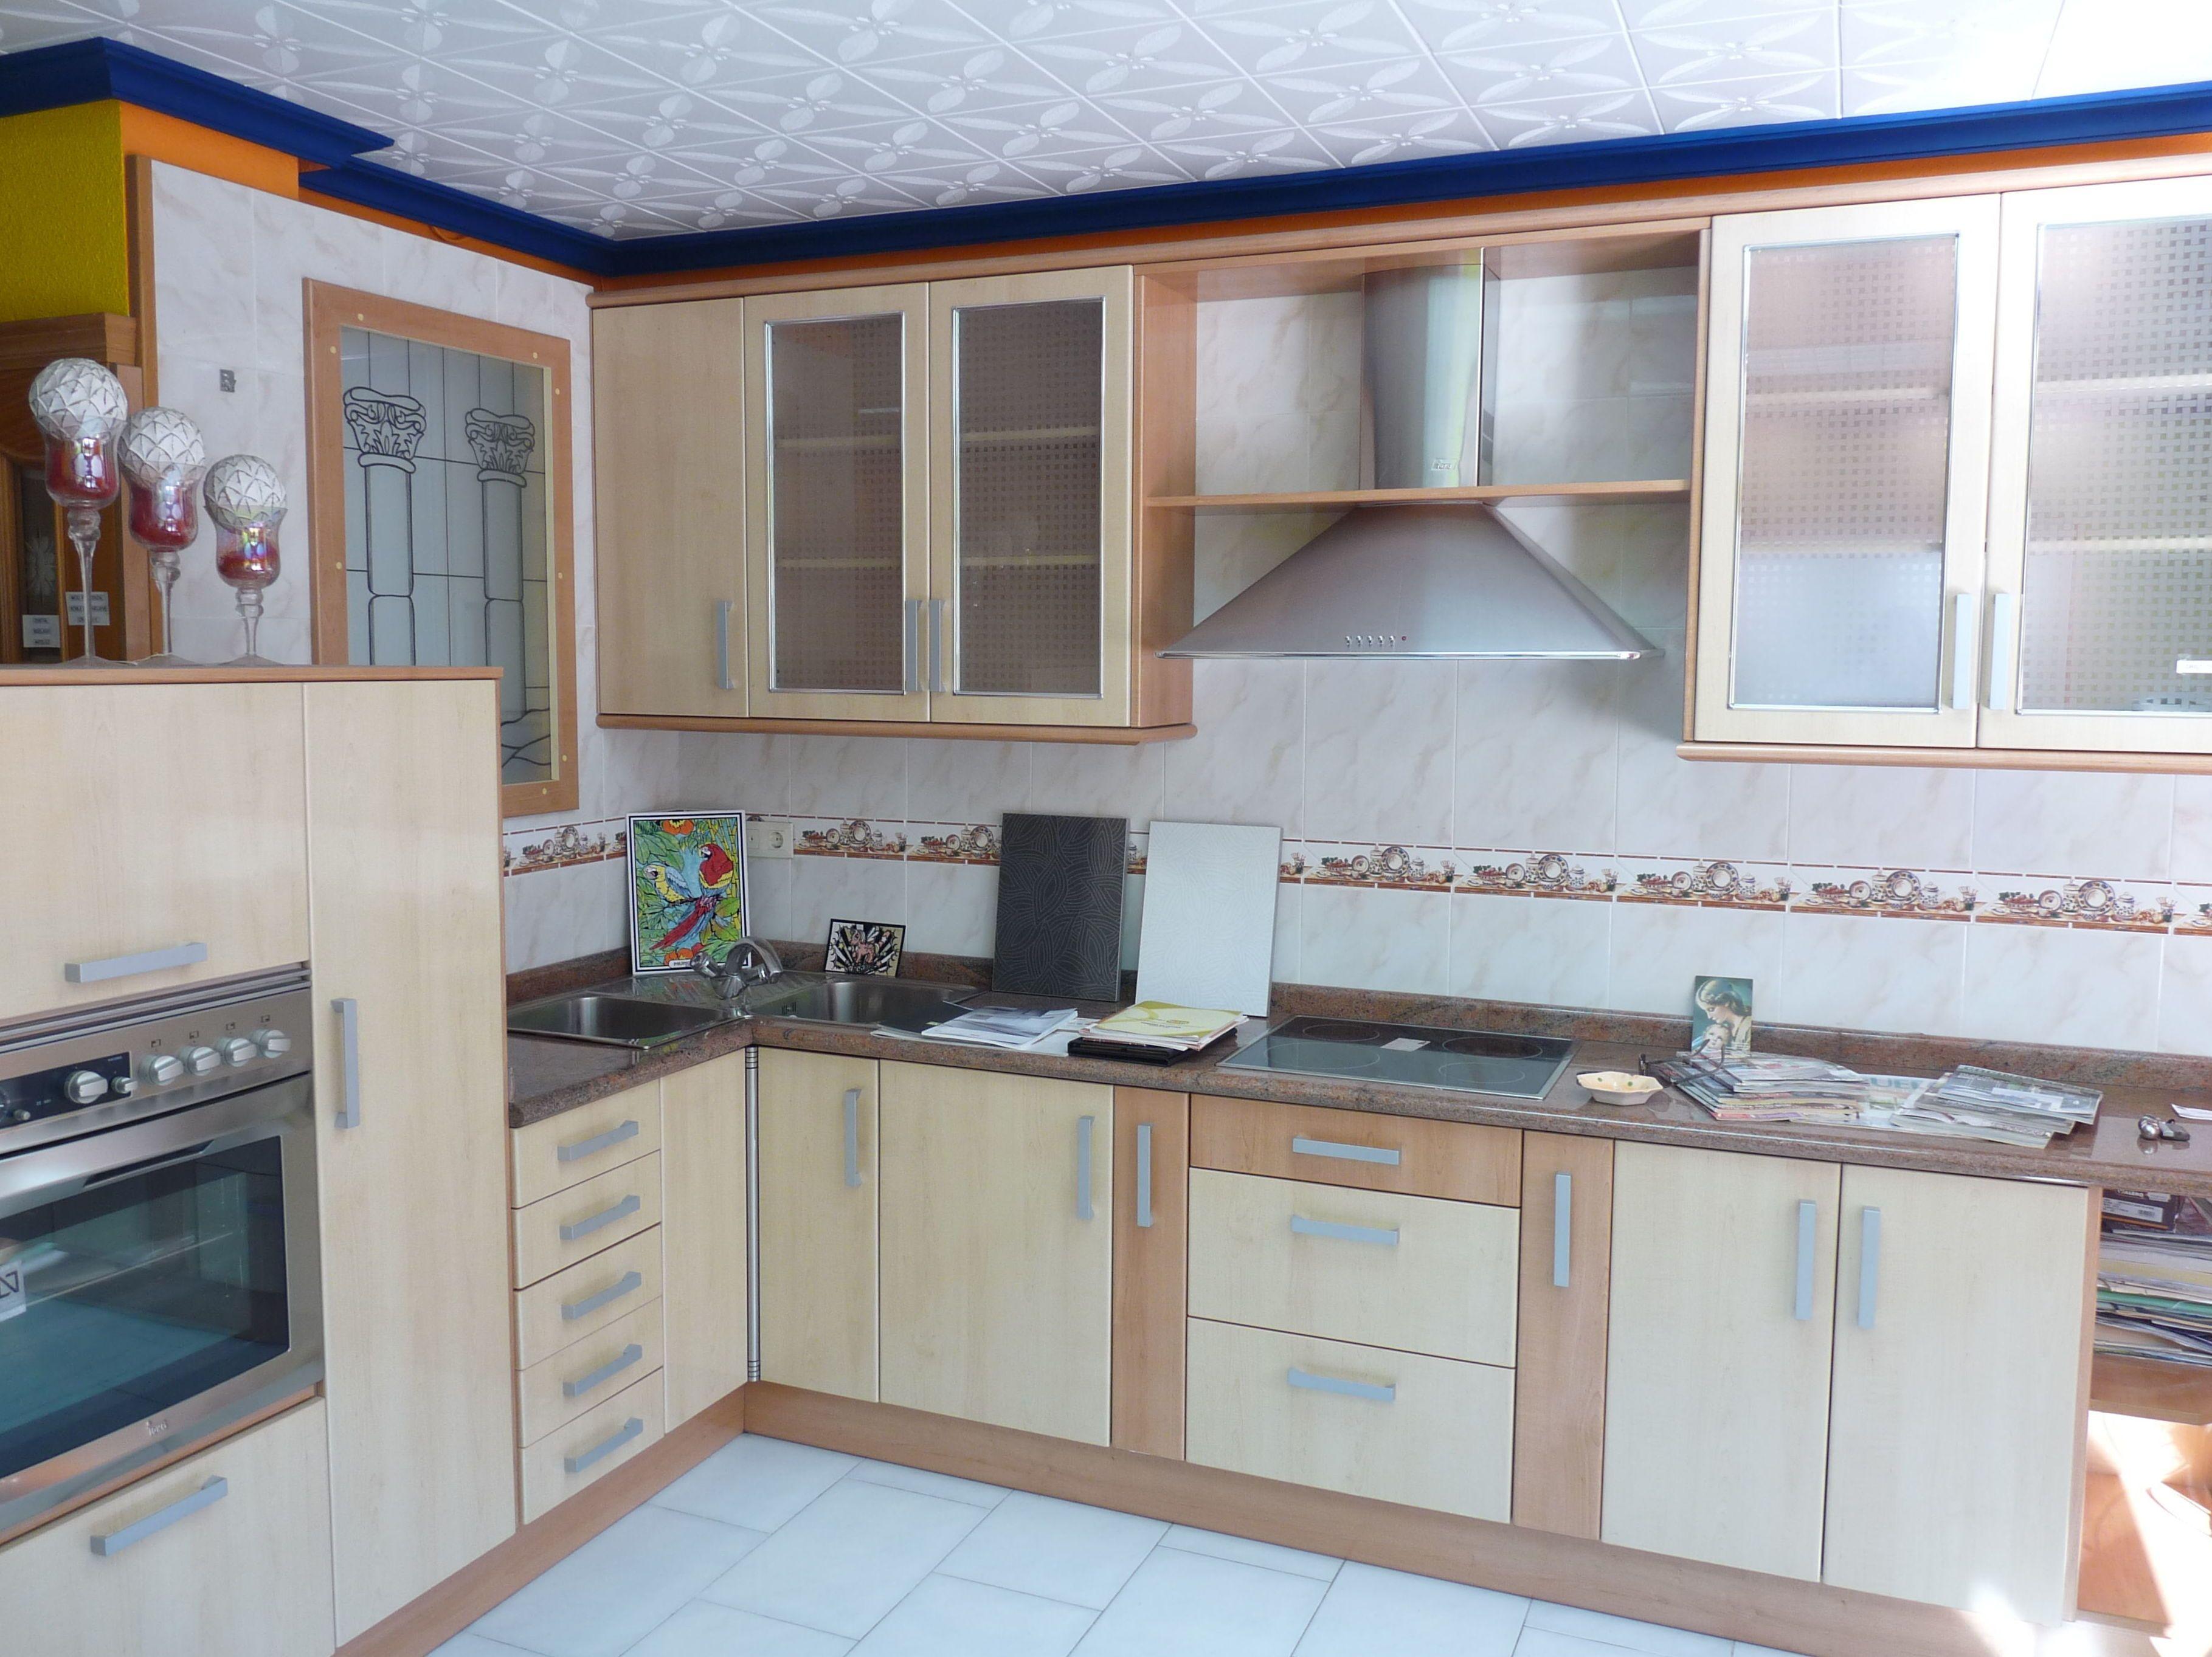 Muebles rekalde kit obtenga ideas dise o de muebles para su hogar aqu - Muebles de cocina en kit ikea ...